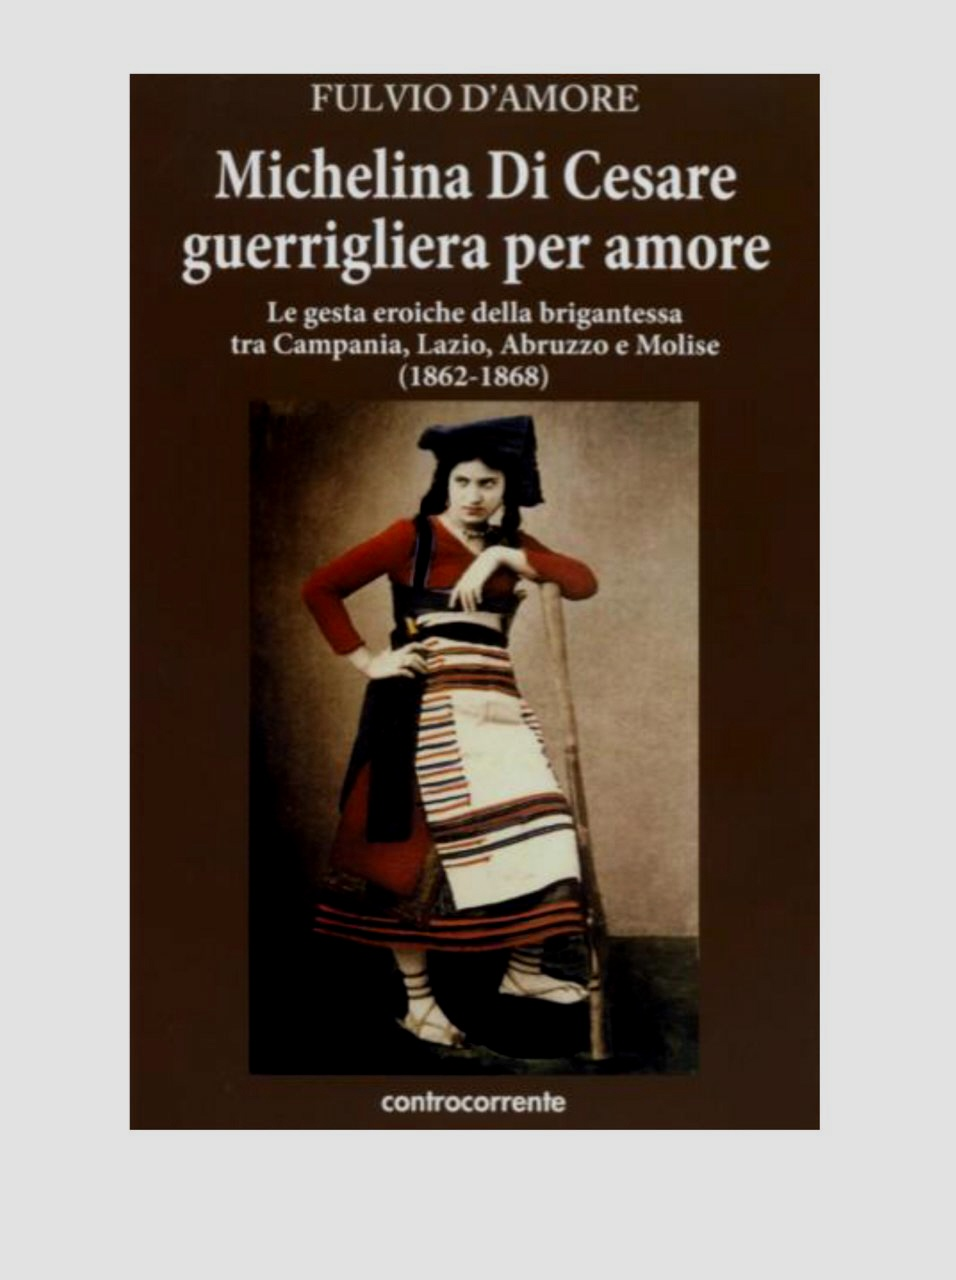 Ranucci teatro Fellini Pontinia 5#001